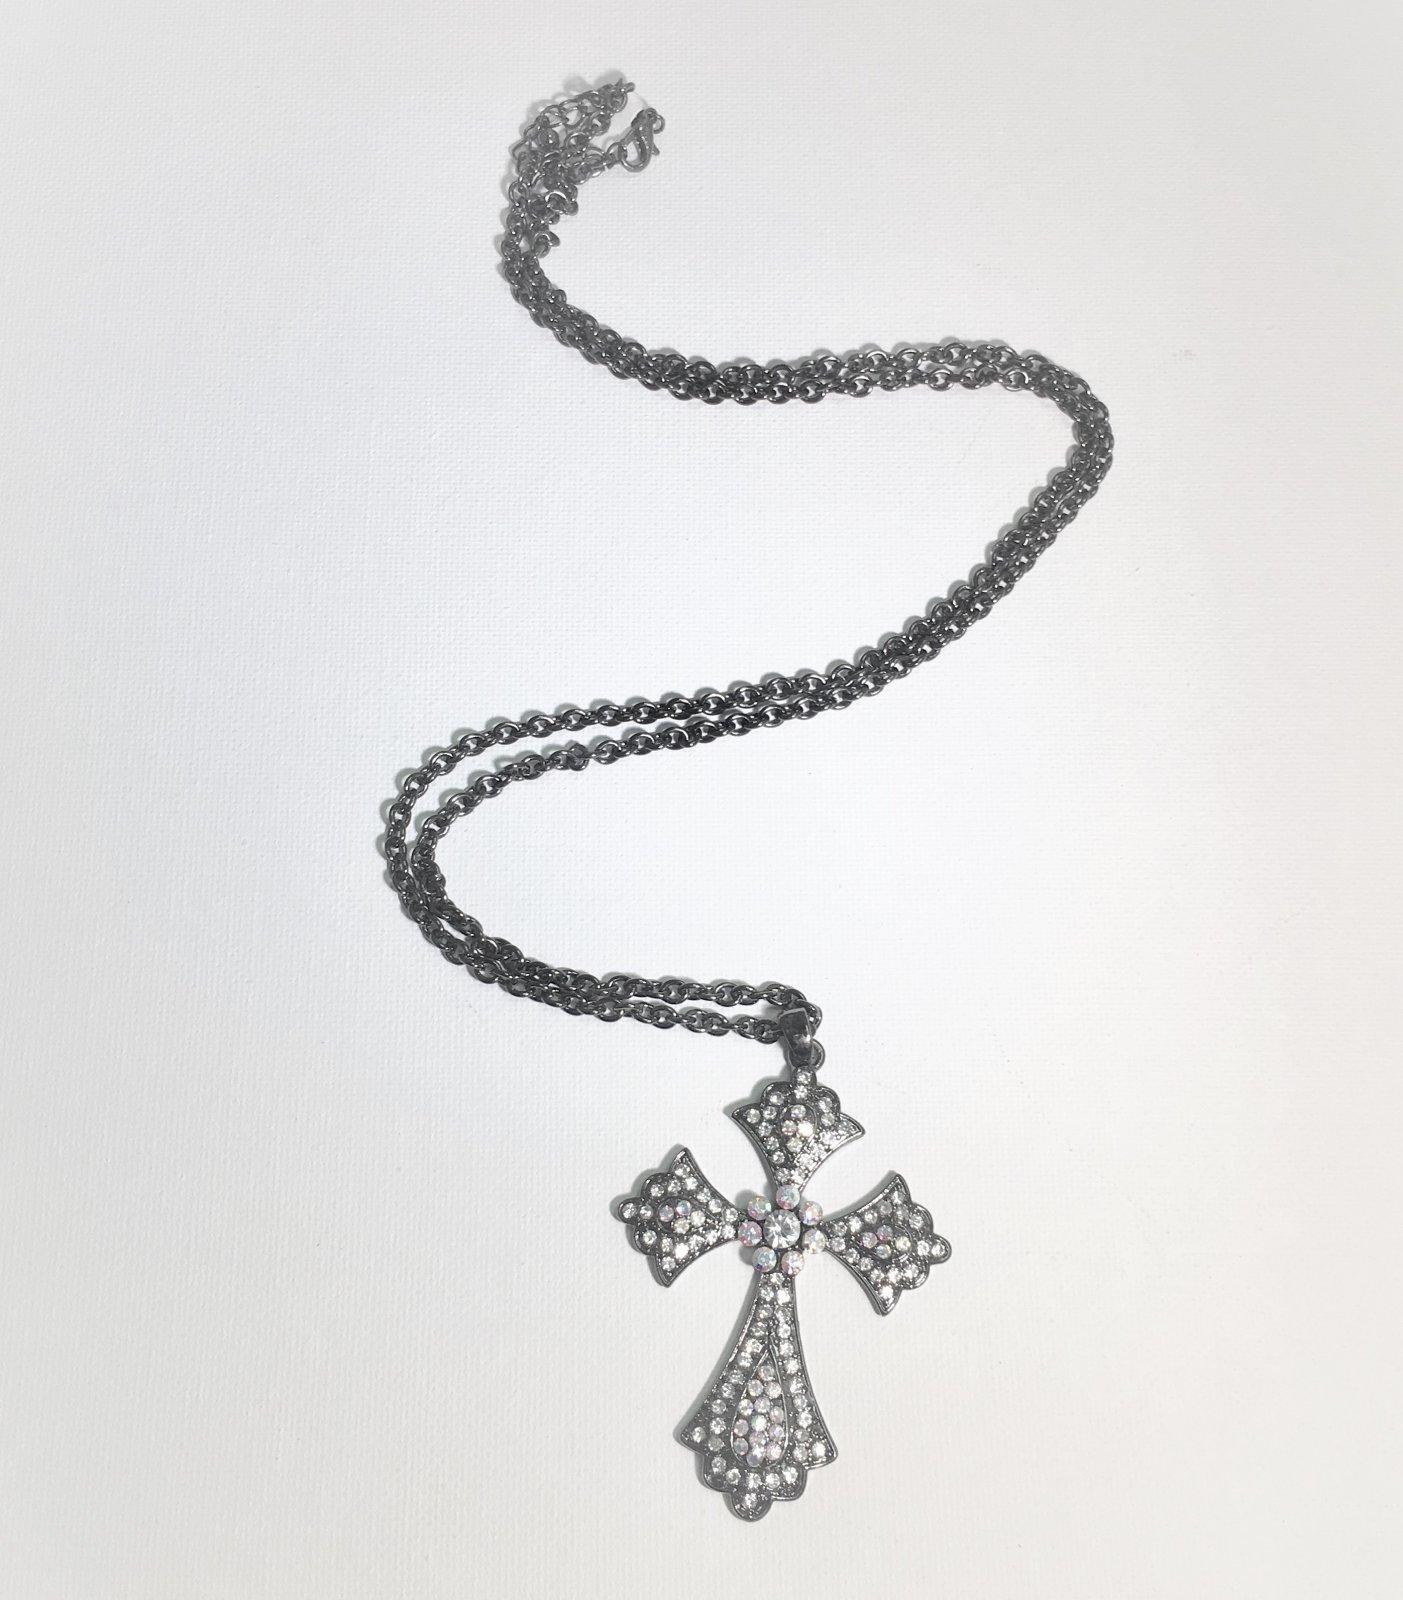 Black Chain Rhinestone Cross Necklace 0019